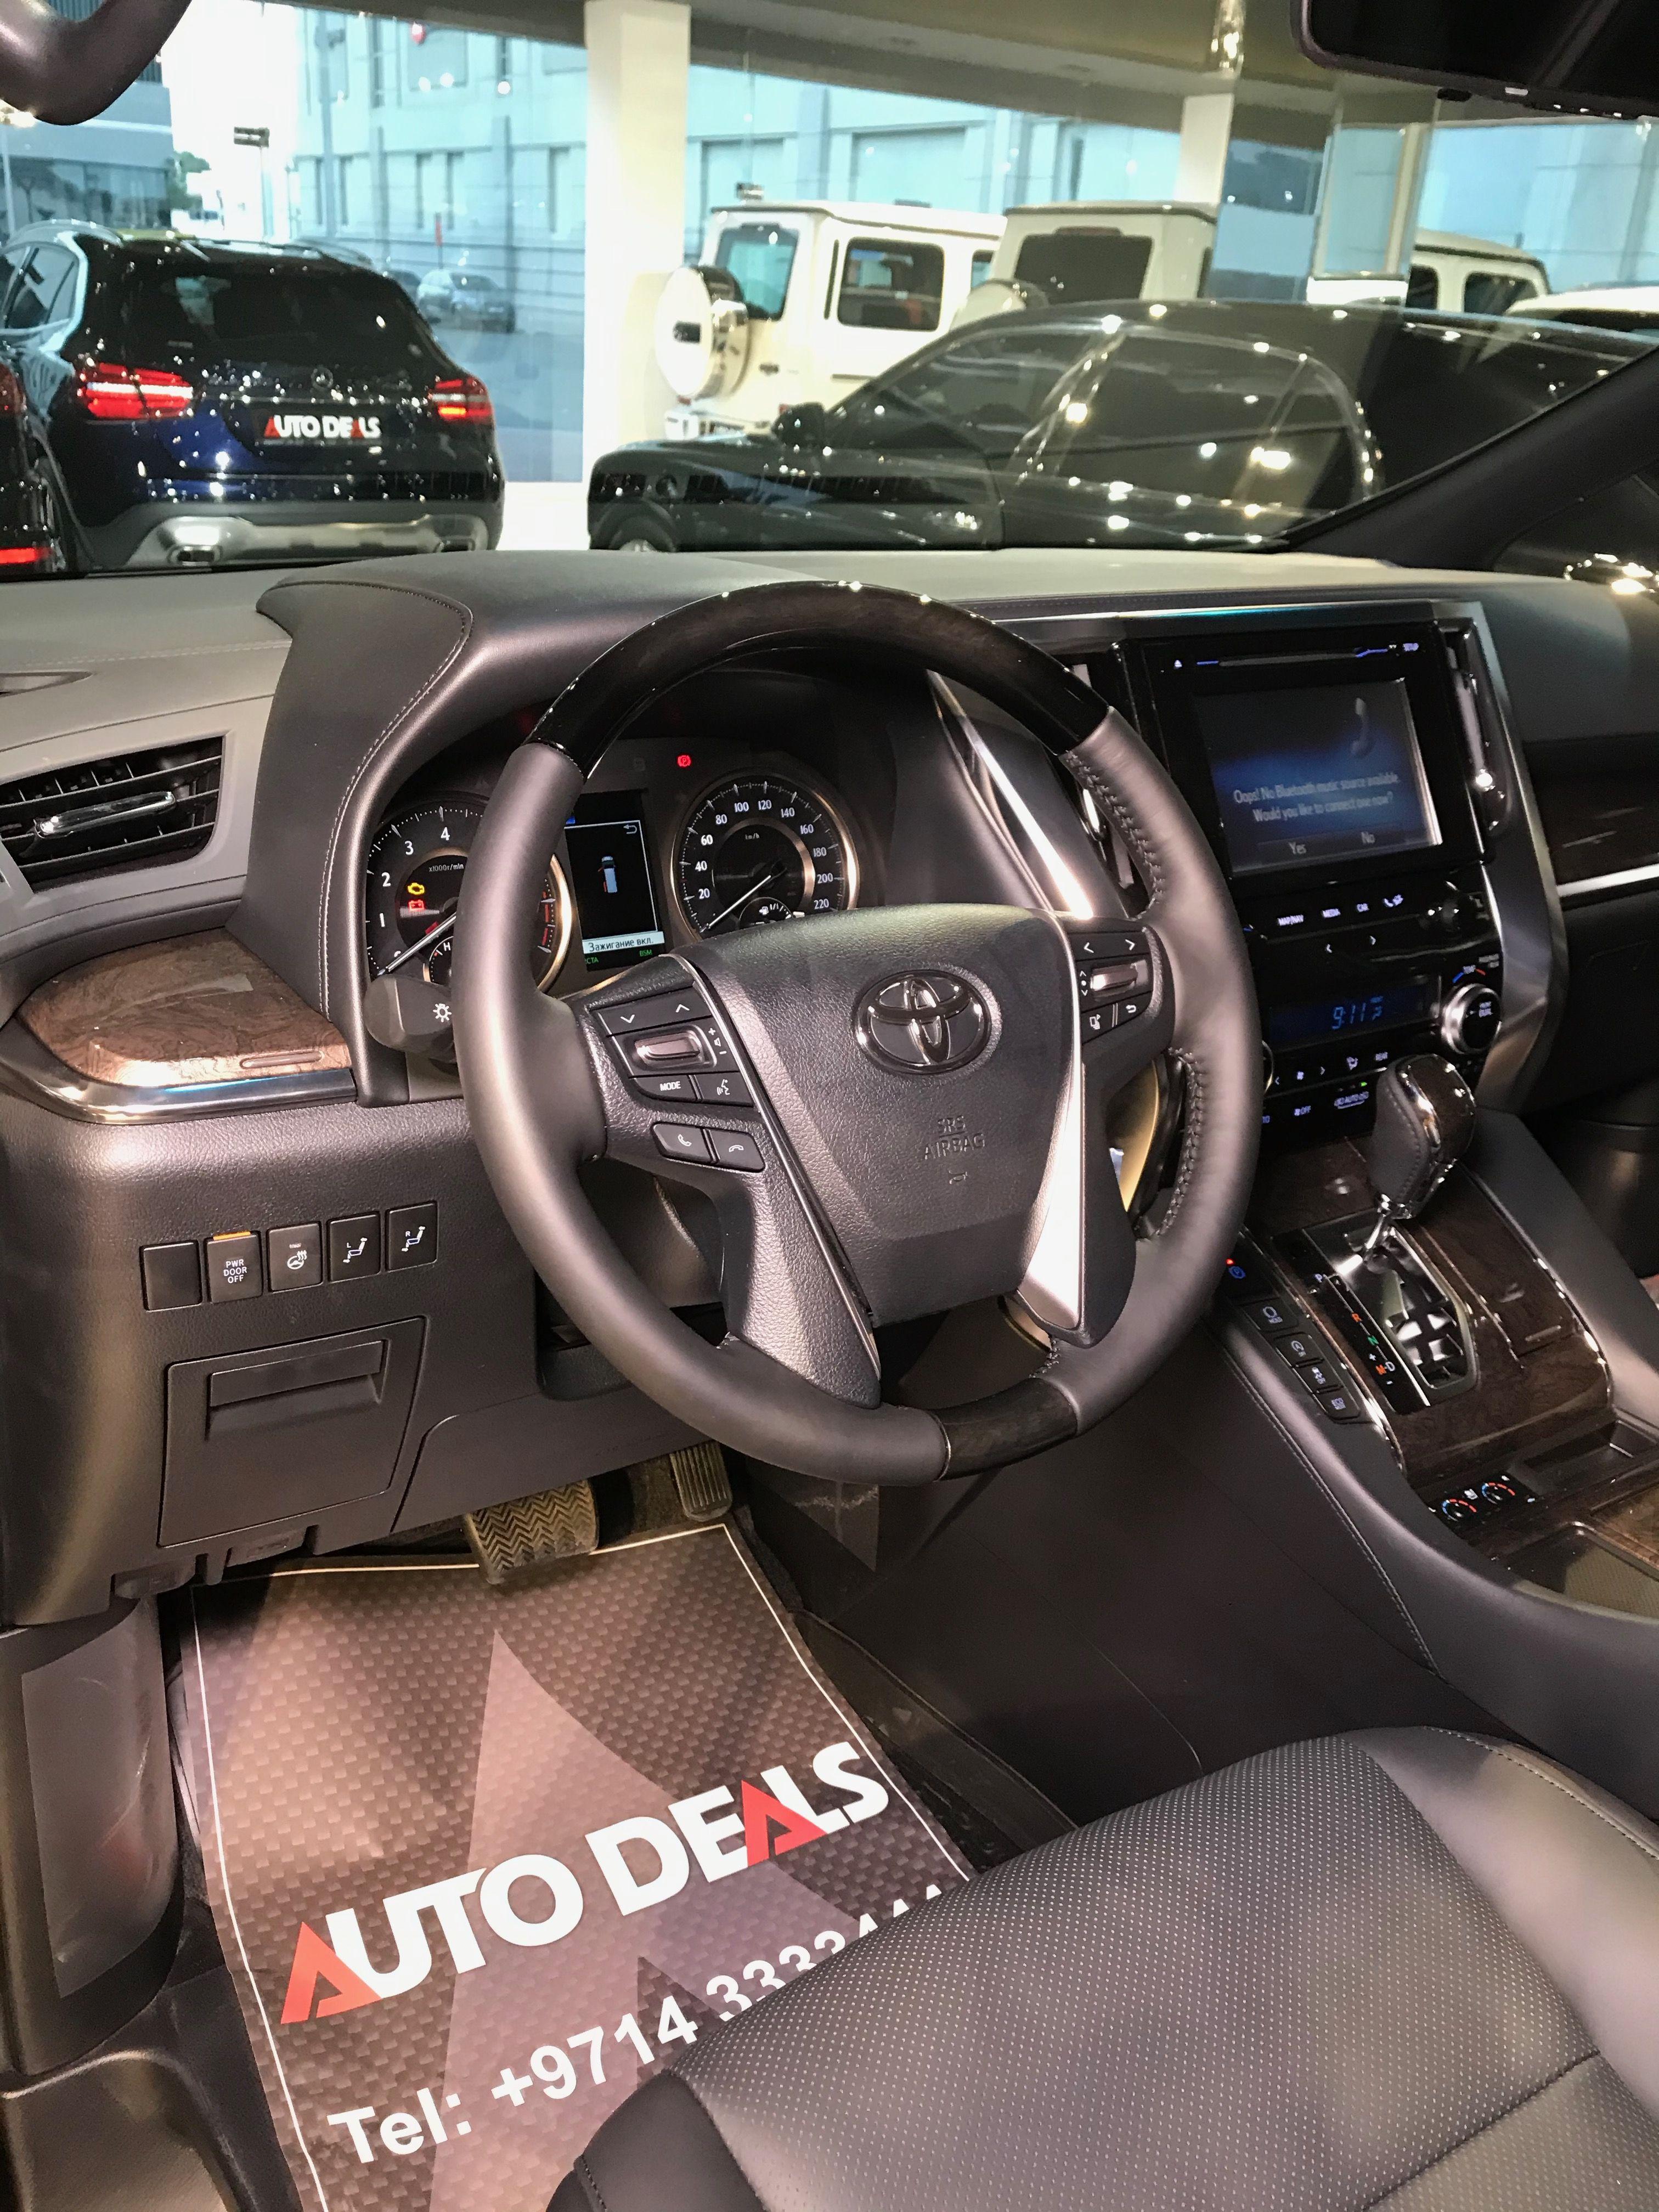 Toyota Alphard Executive Lounge V6 1 23 Crore Real Life Review In 2020 Toyota Alphard Toyota Mini Van